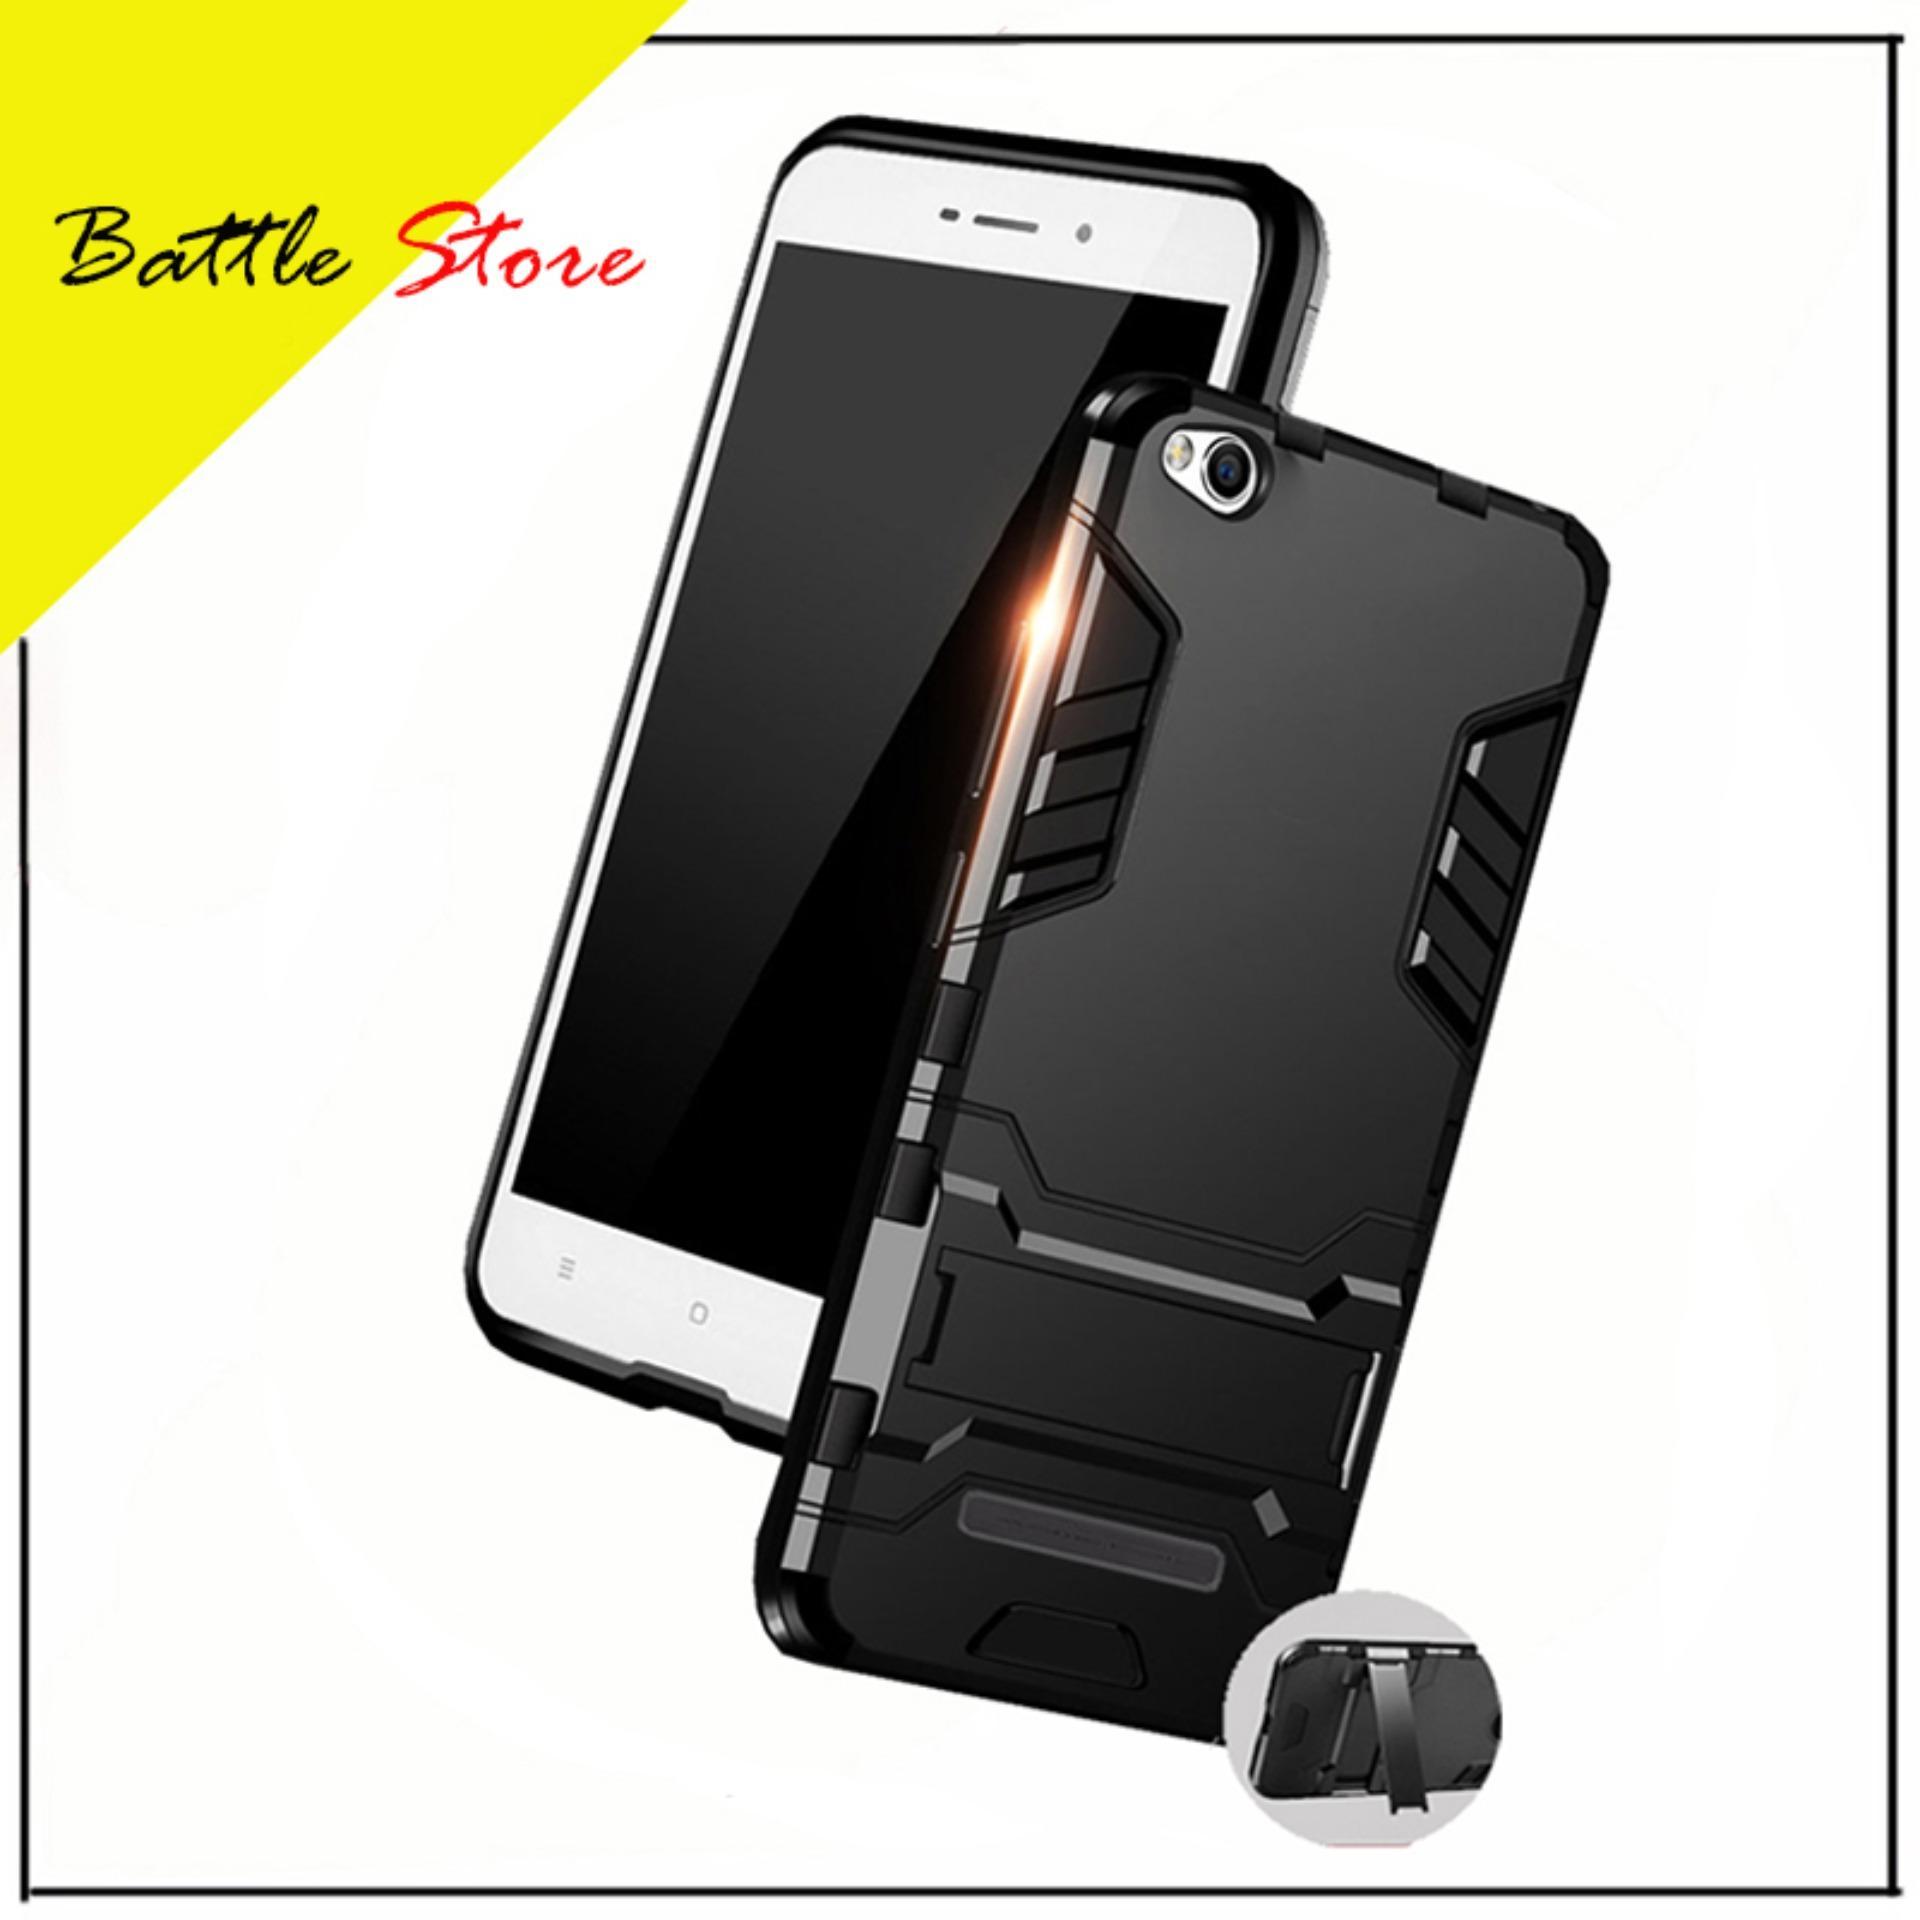 Back Case Xiaomi Redmi 5A Iron Man Robot Transformer Ironman Limited - Black